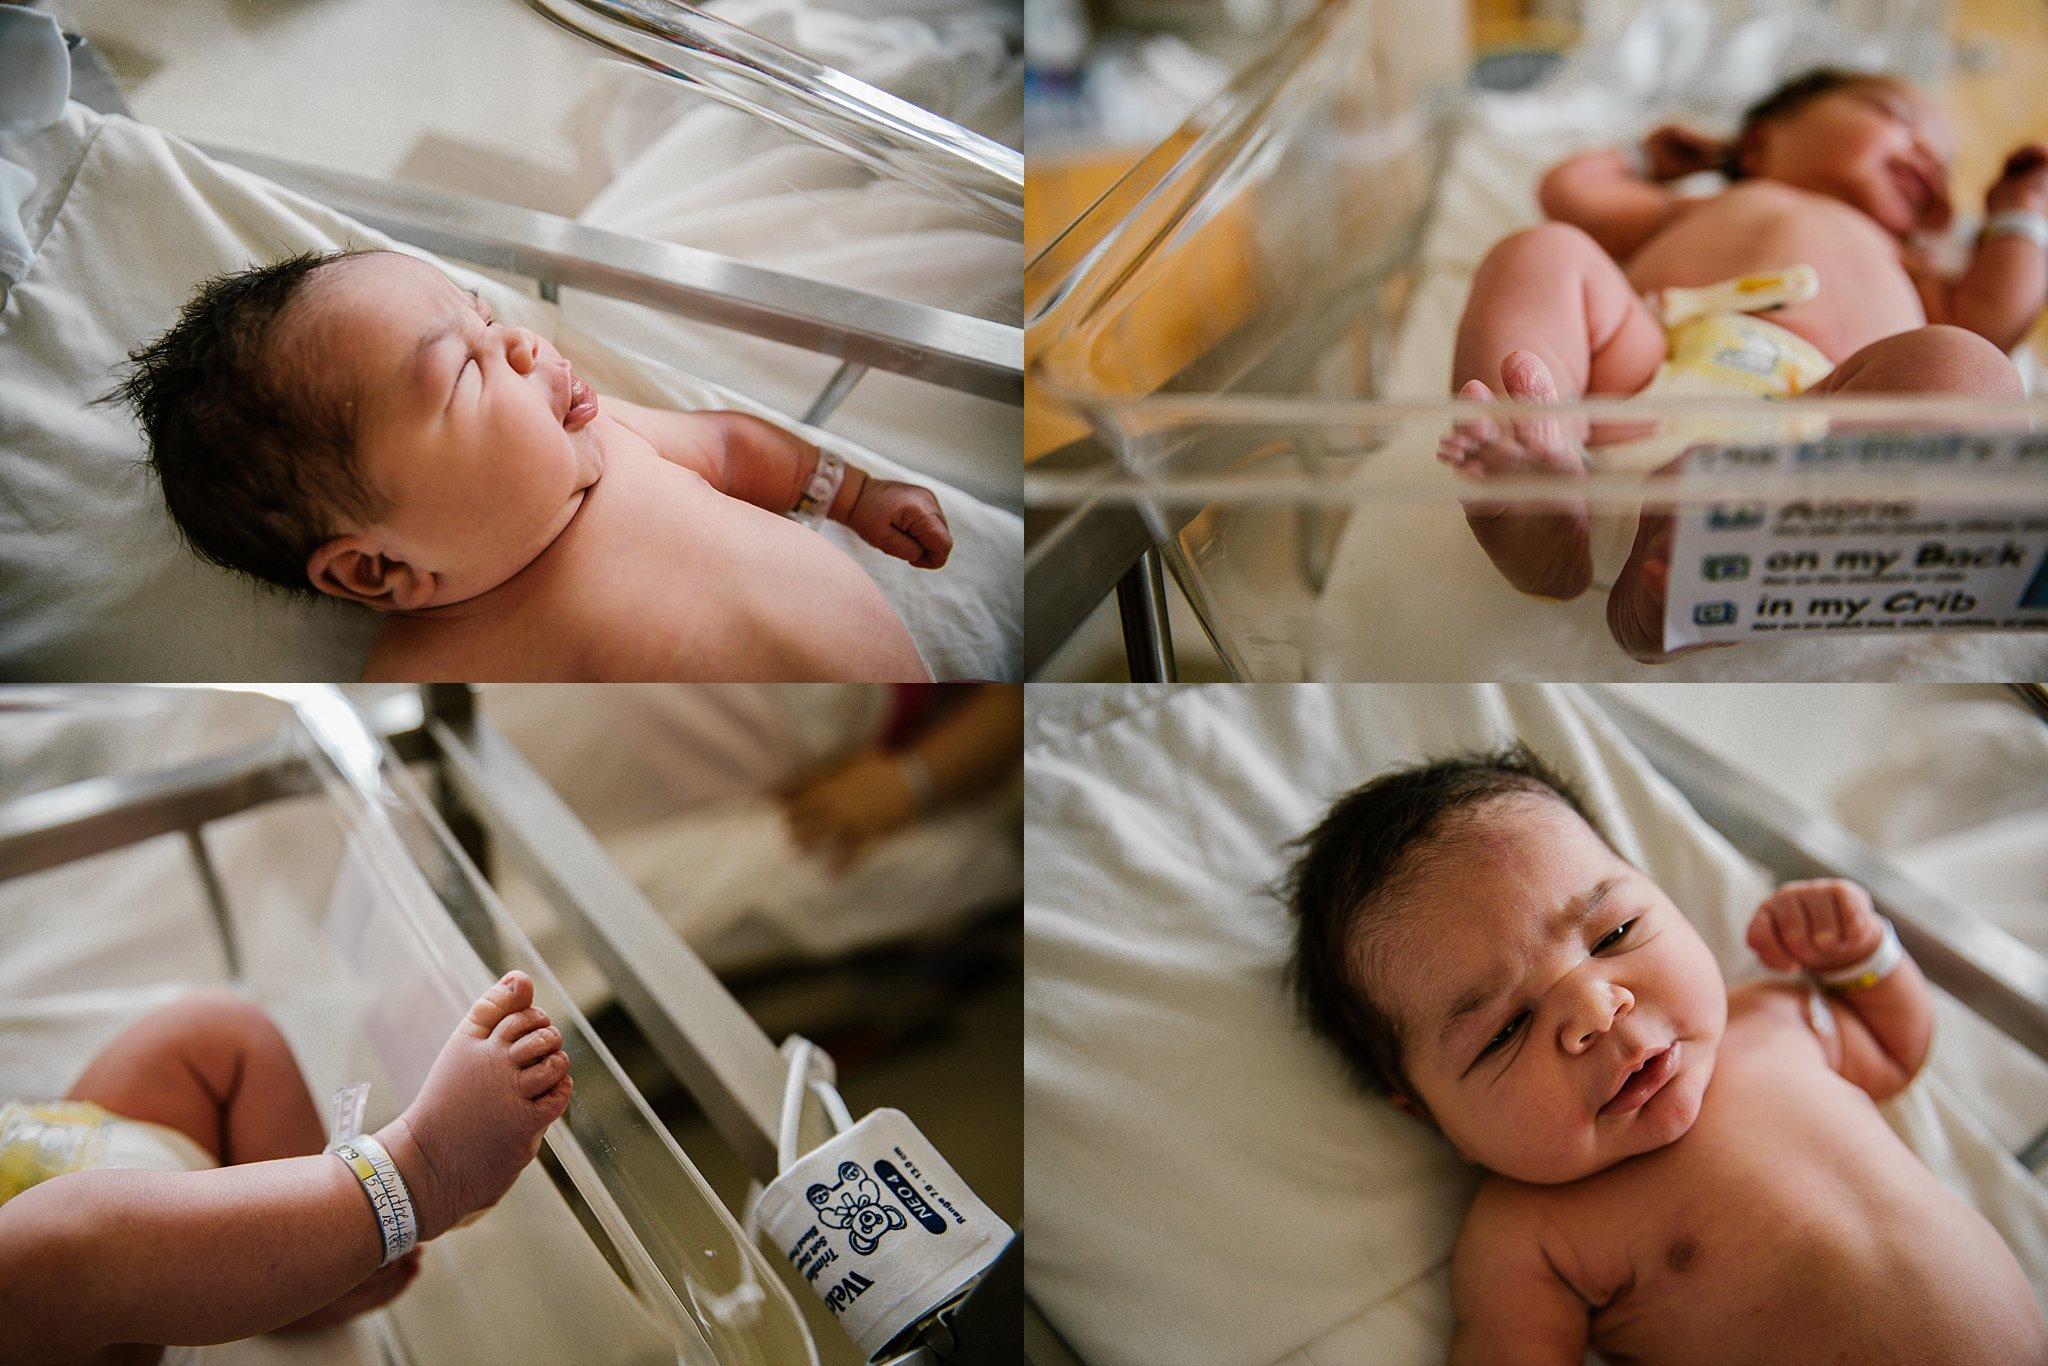 20180310-lake-regional-camdenton-hospital-newborn-picture-best-baby-photographer-missouri-osage-beach-01.jpg